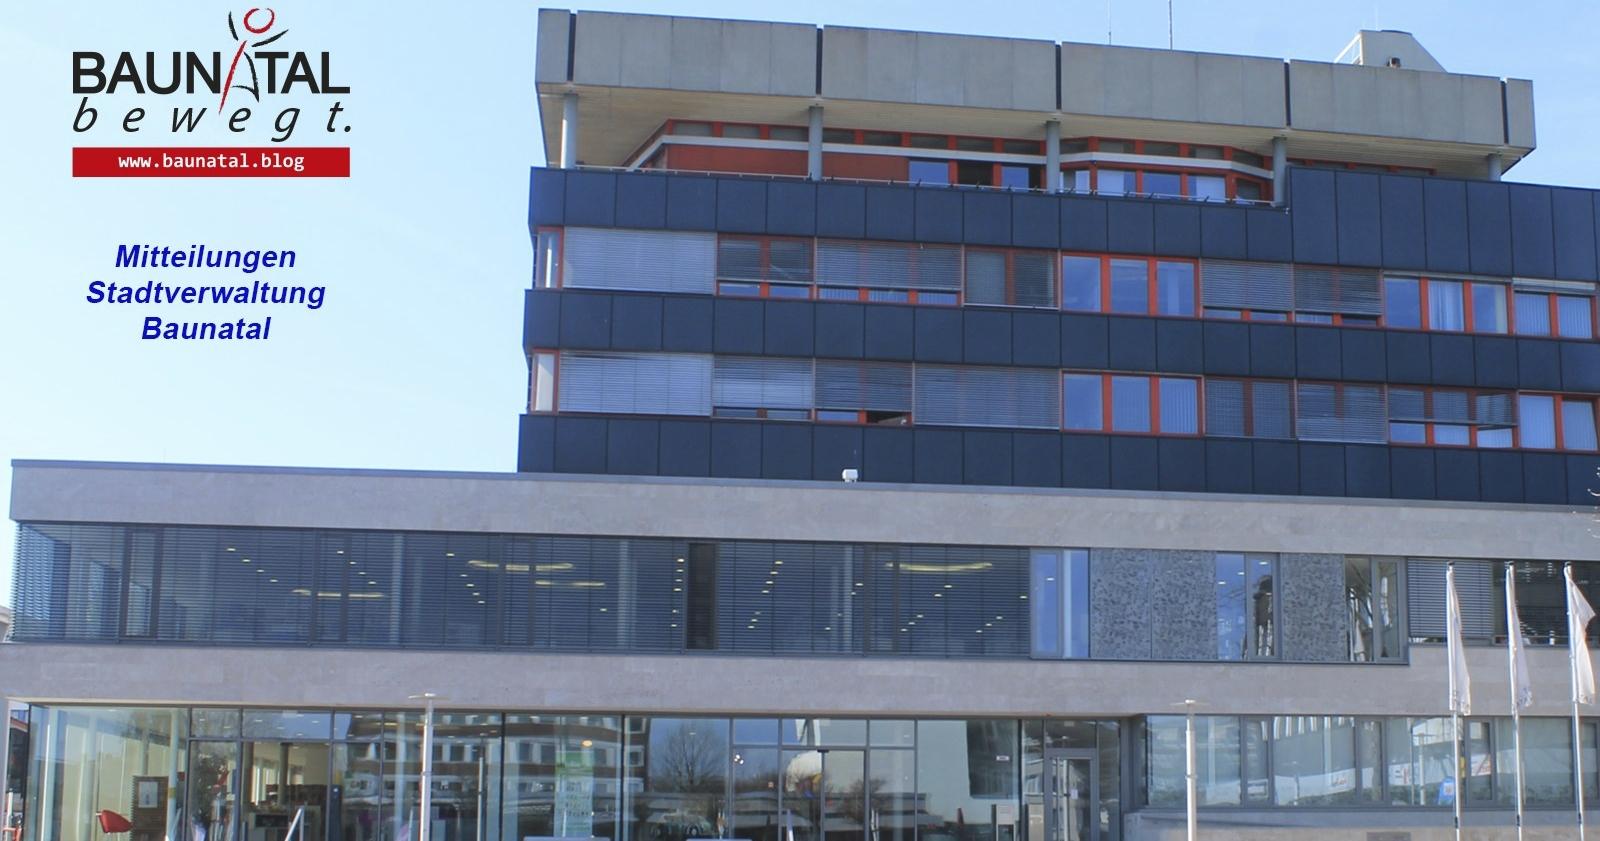 Baunatal, Stadtverwaltung Baunatal